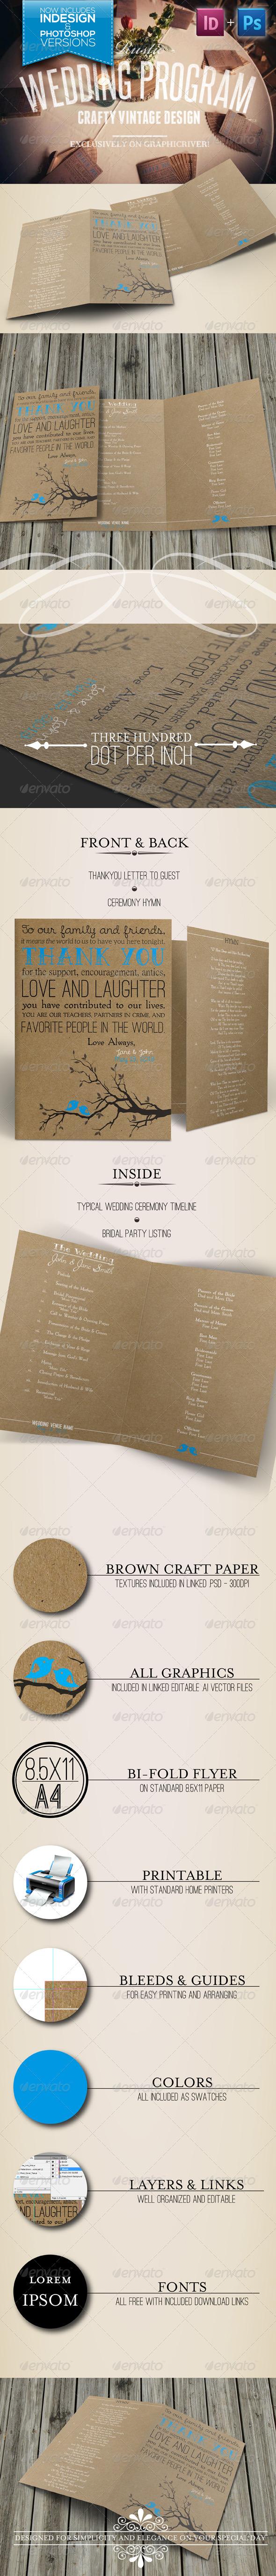 Rustic Wedding Program - Weddings Cards & Invites